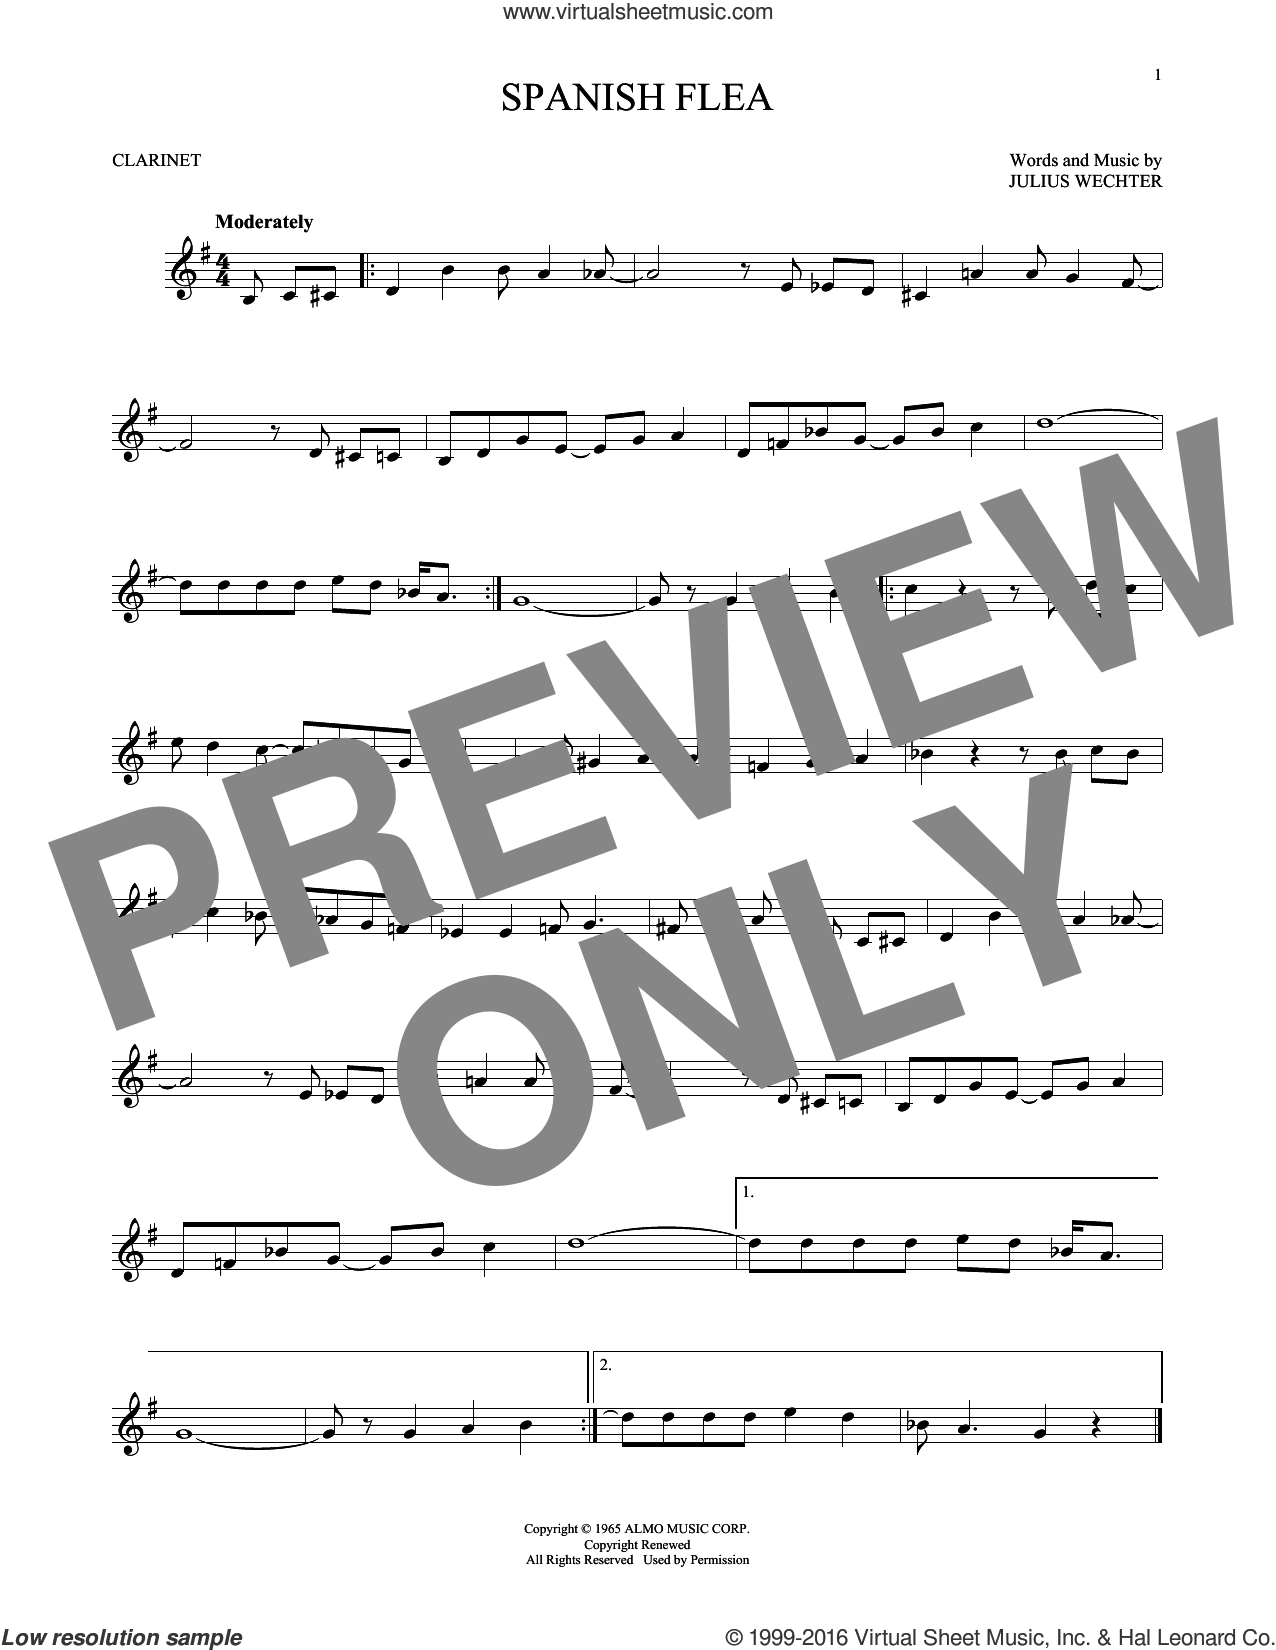 Spanish Flea sheet music for clarinet solo by Herb Alpert & The Tijuana Brass and Julius Wechter, intermediate skill level